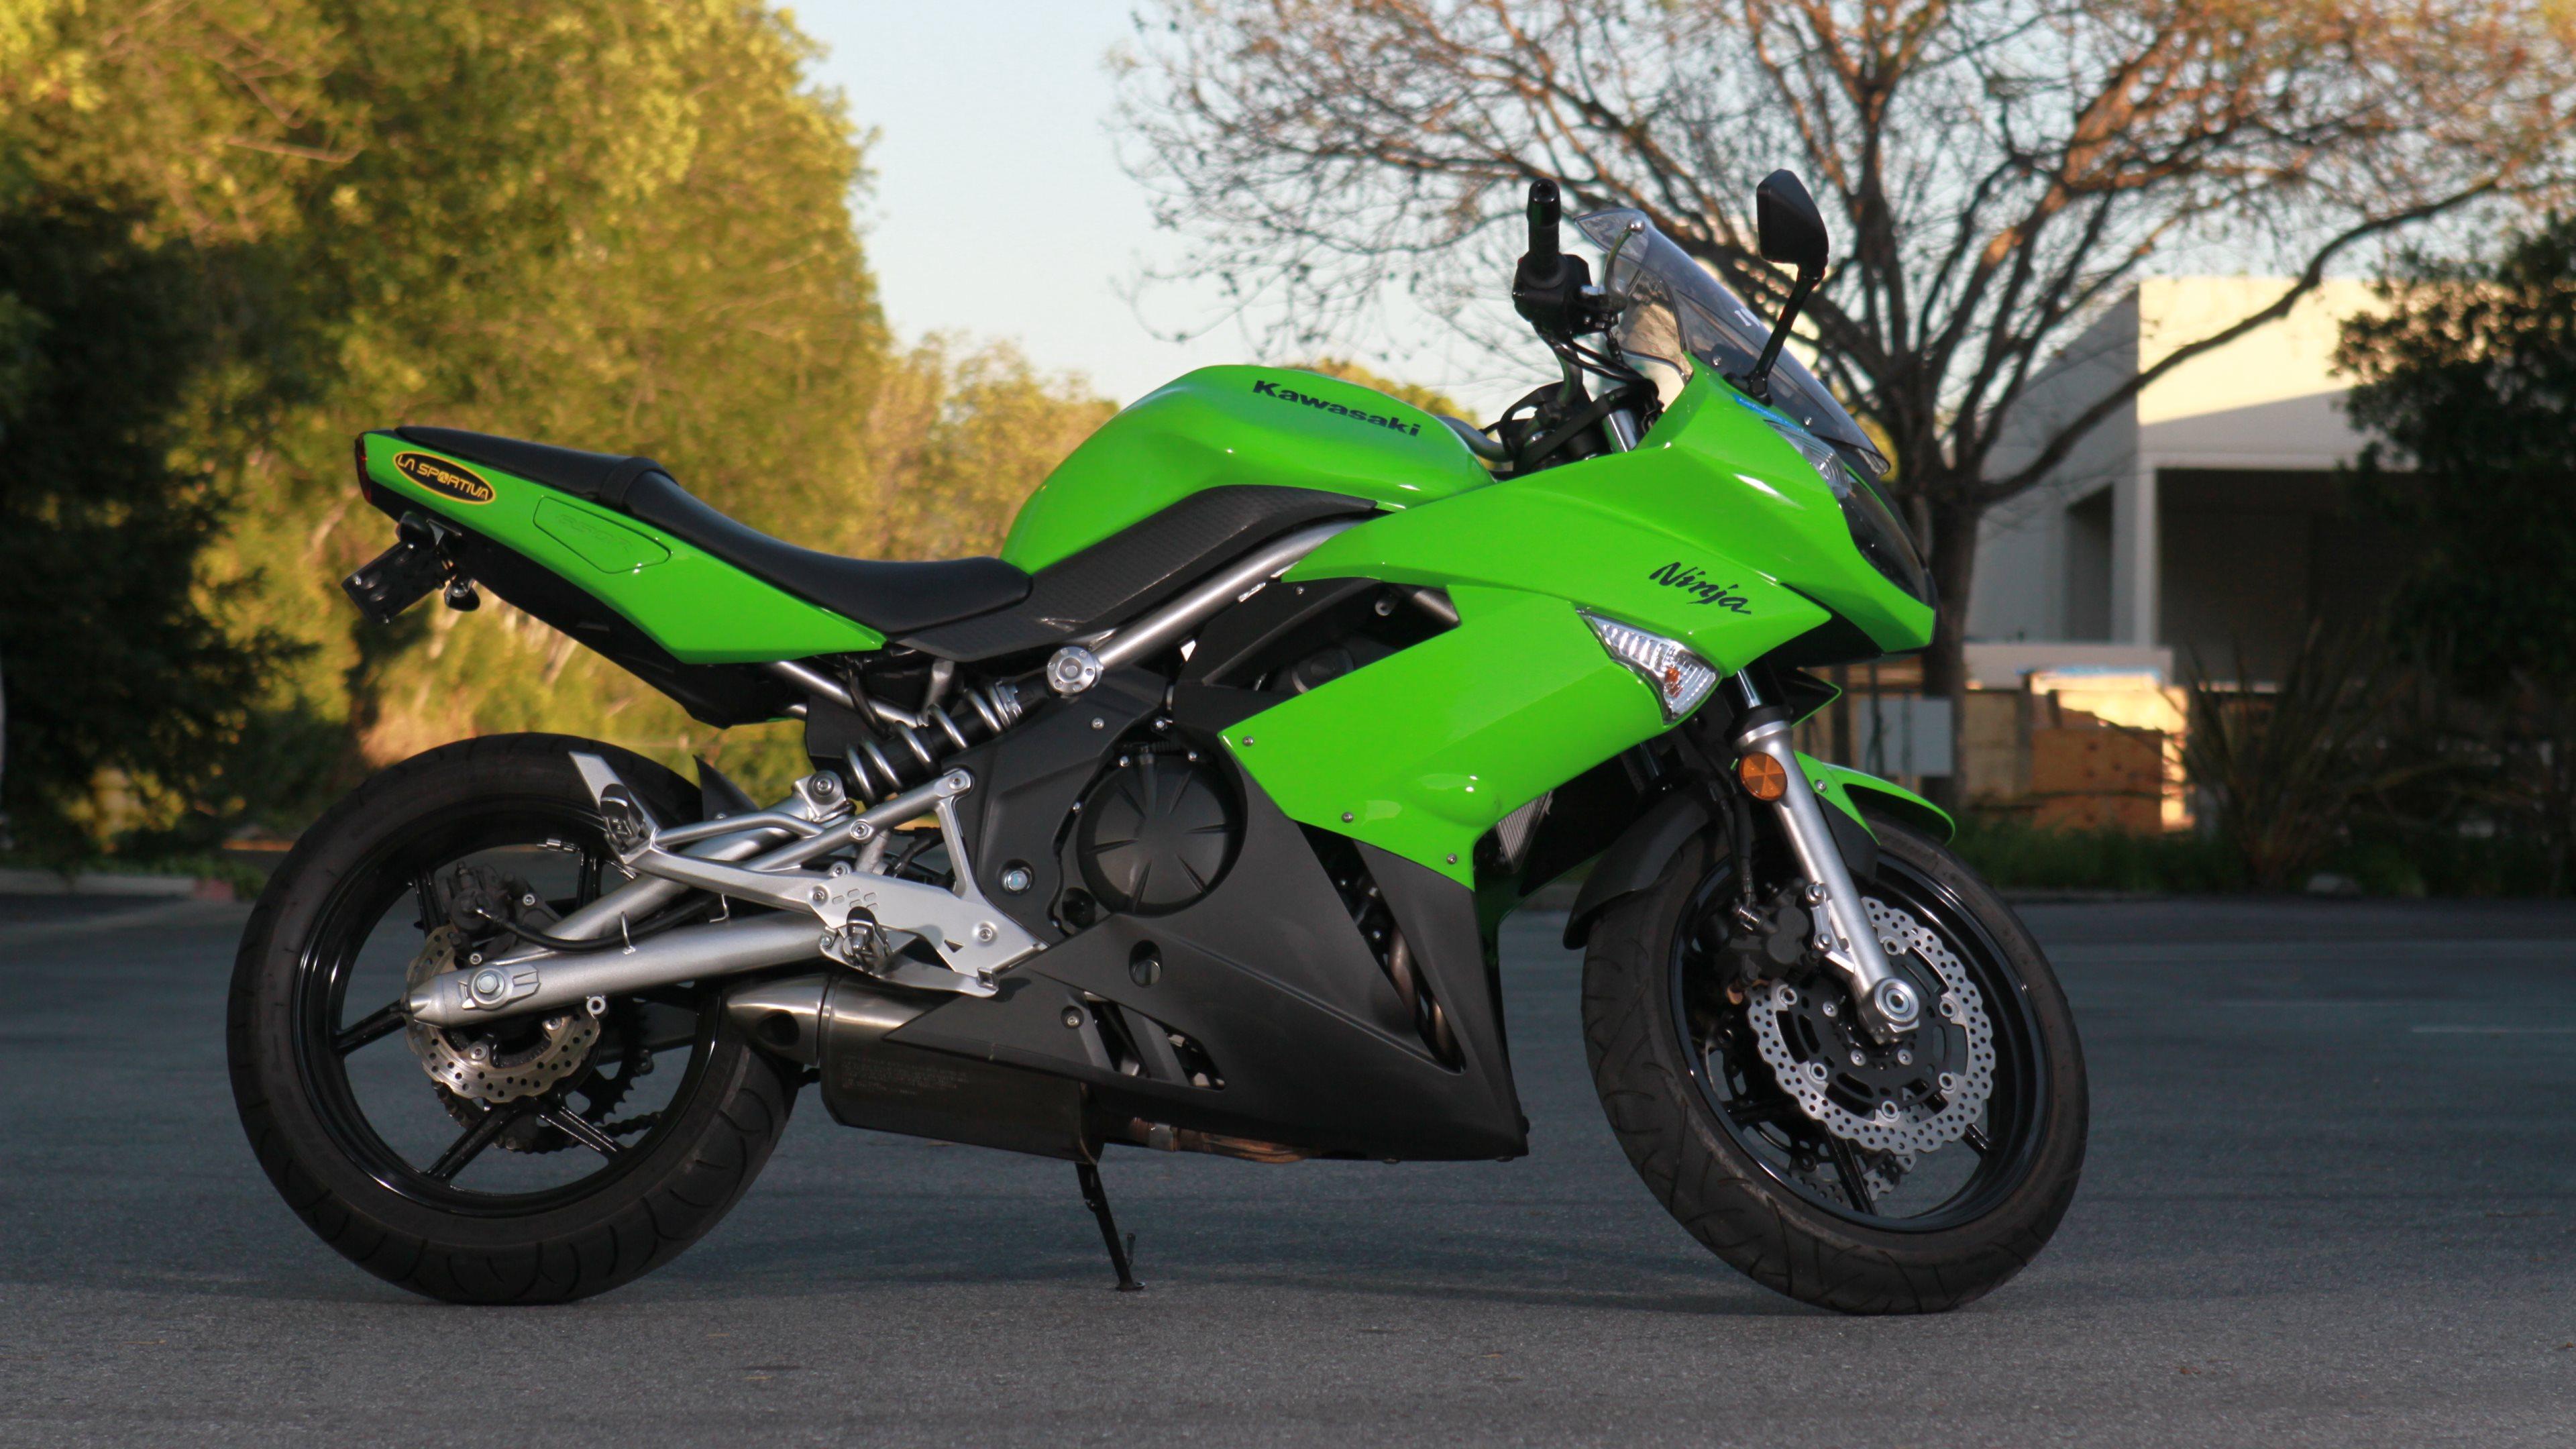 Kawasaki Ninja Yamaha R6 Motorcycles Hd Wallpapers 4k Macbook